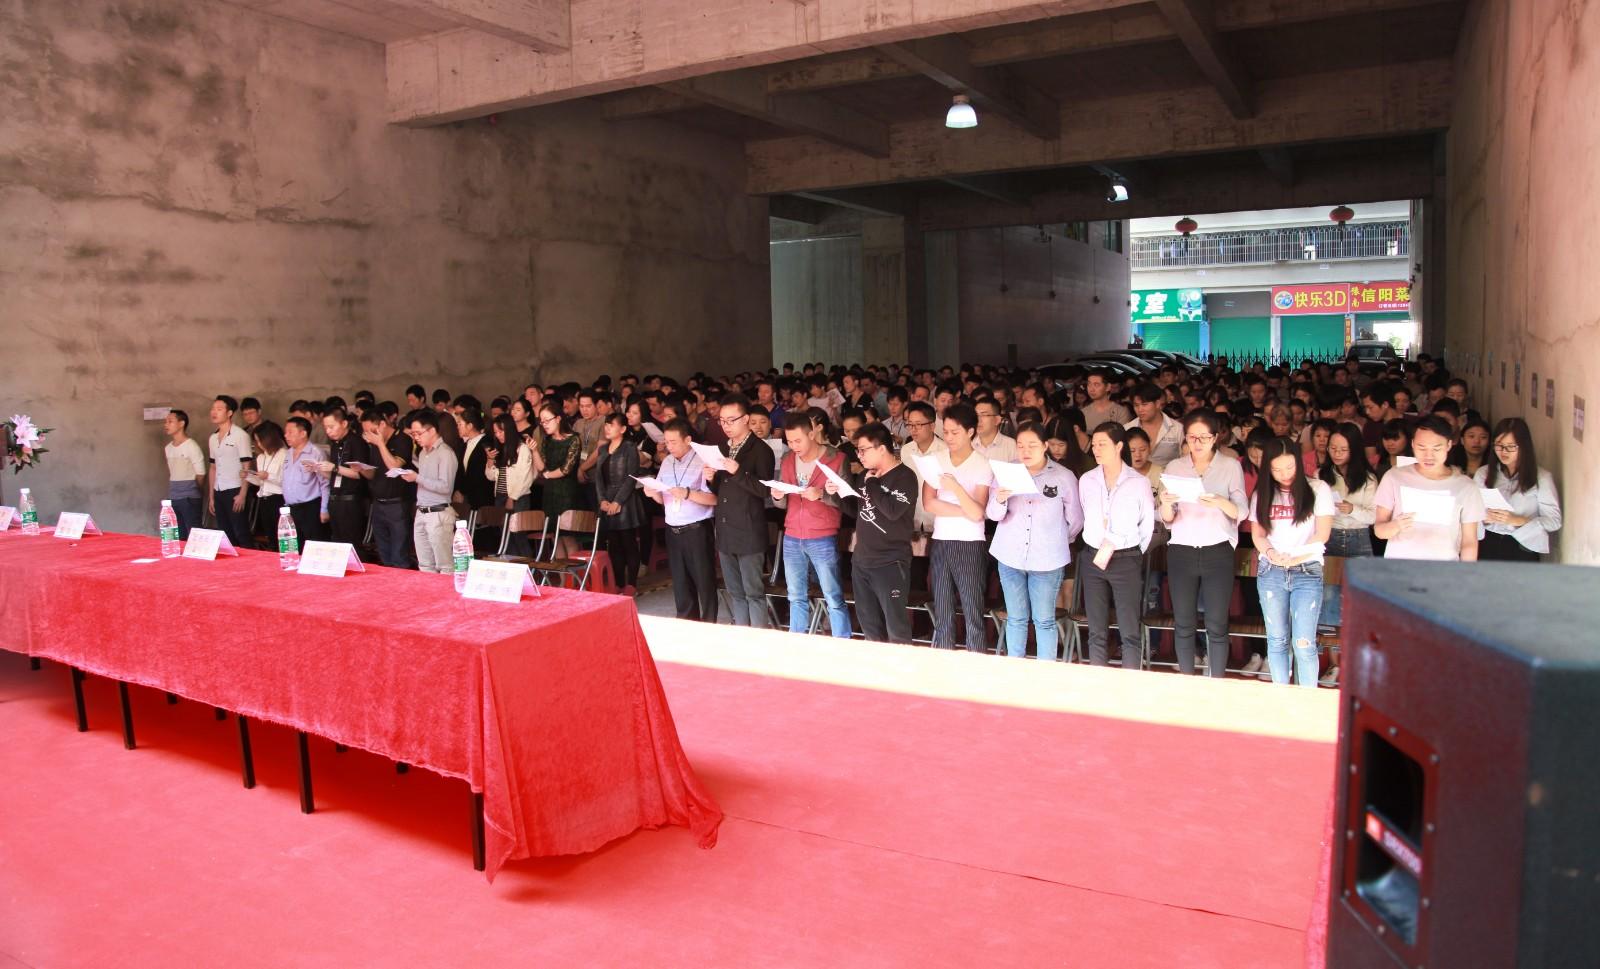 Pengyifa Swearing Ceremony